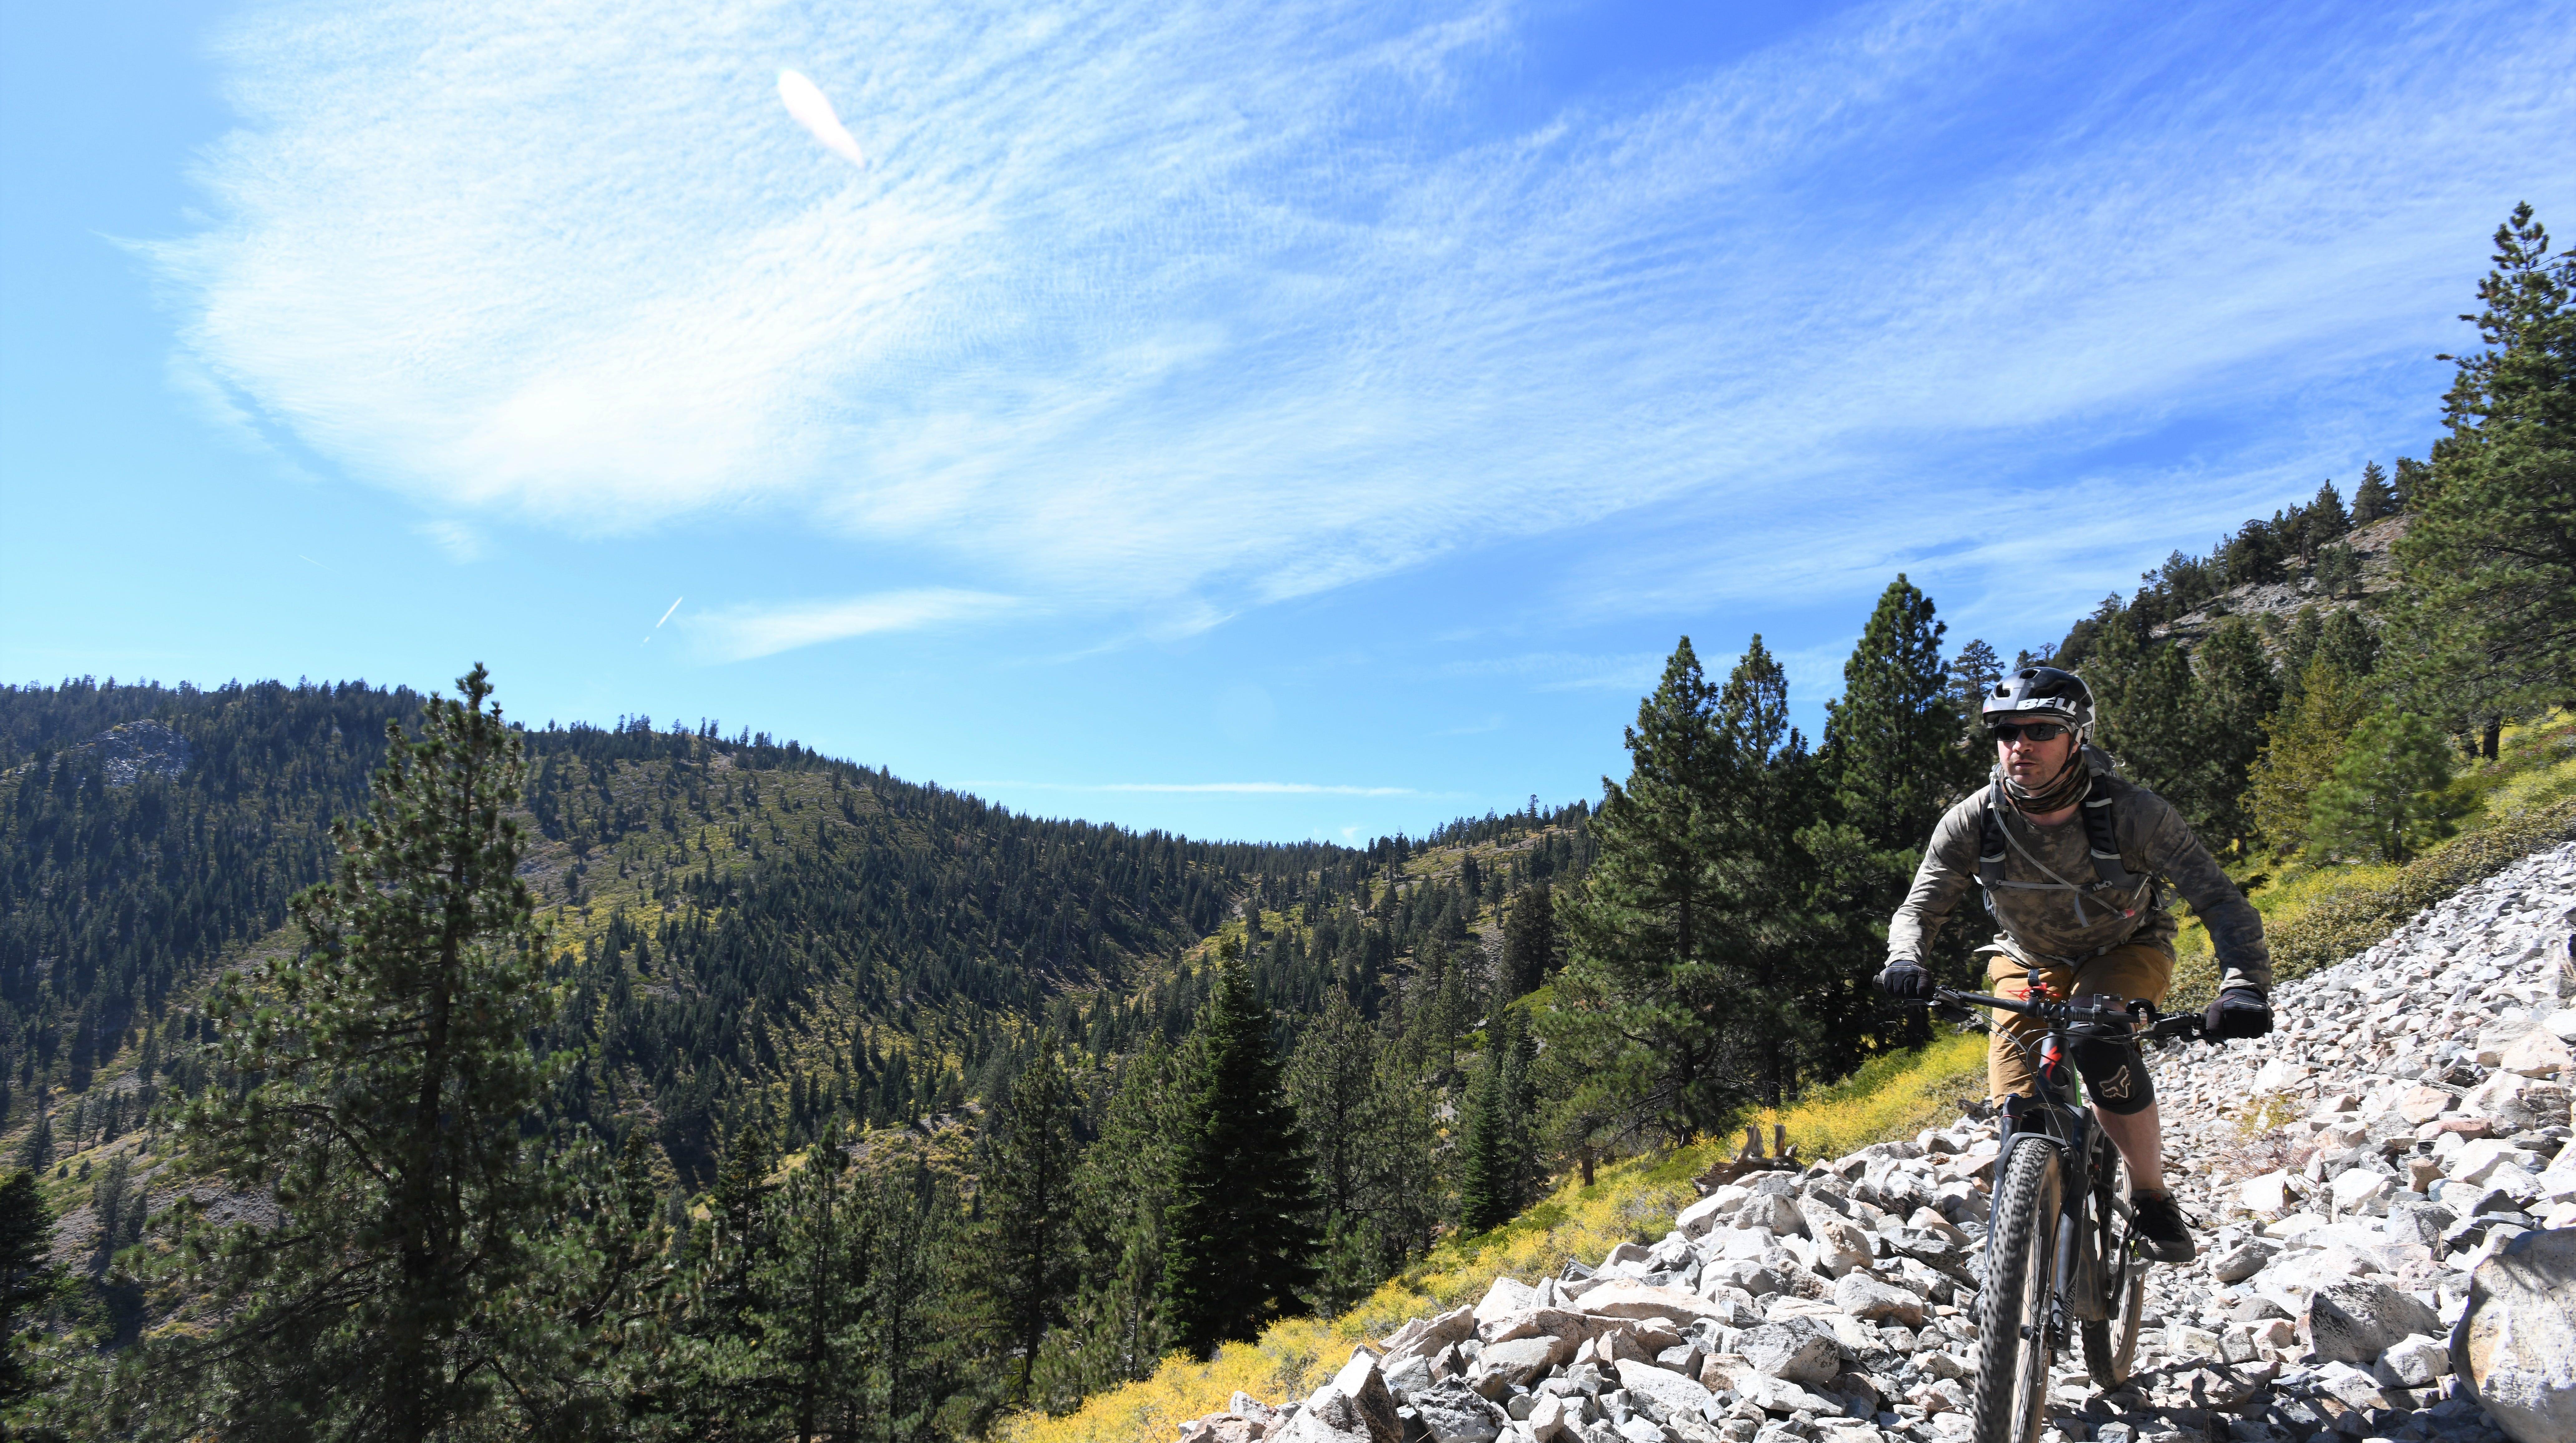 Outdoors writer Benjamin Spillman descends Sierra Canyon near Genoa, Nev., on Sept. 22, 2018.